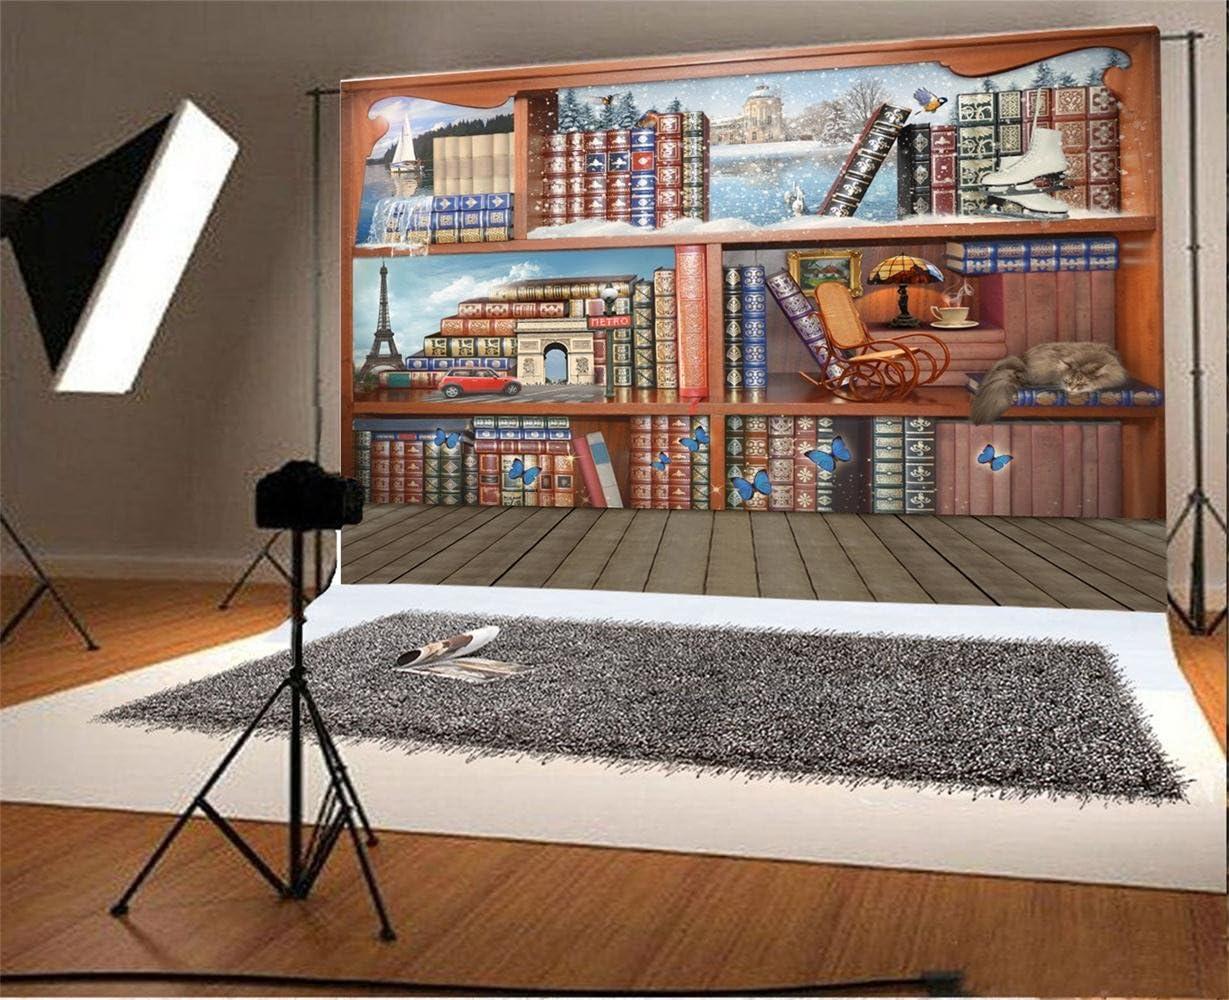 10x6.5ft Vinyl Backdrop Photography Background Magical Books World Bookshelf Photo Background Fantasy Illusion Winter Season Indoor Wood Floor Vintage Butterflies Backdrop Photo Studio Prop